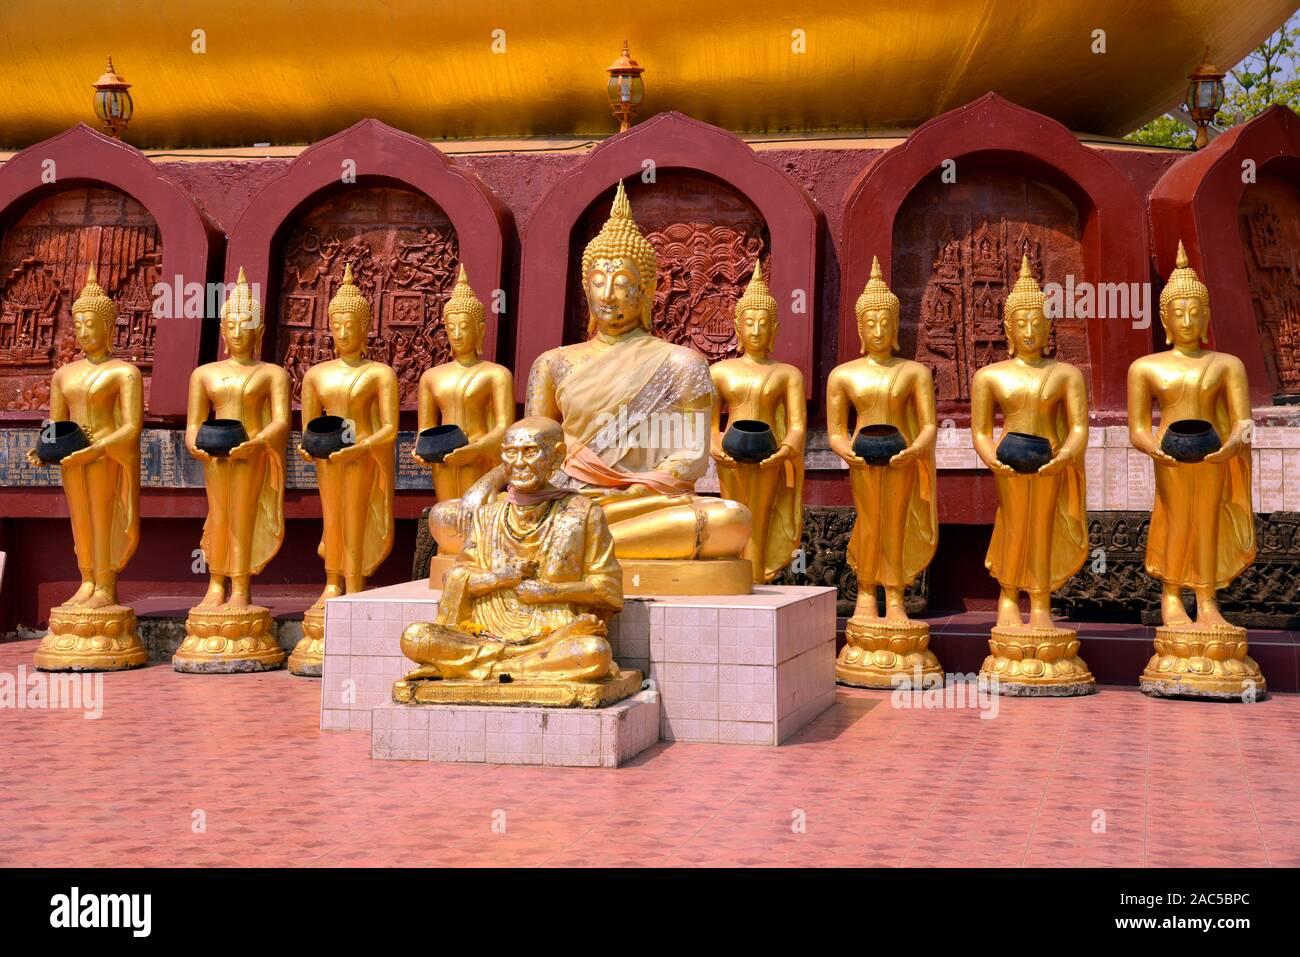 Bettelnde Buddhas in Thailand Stock Photo